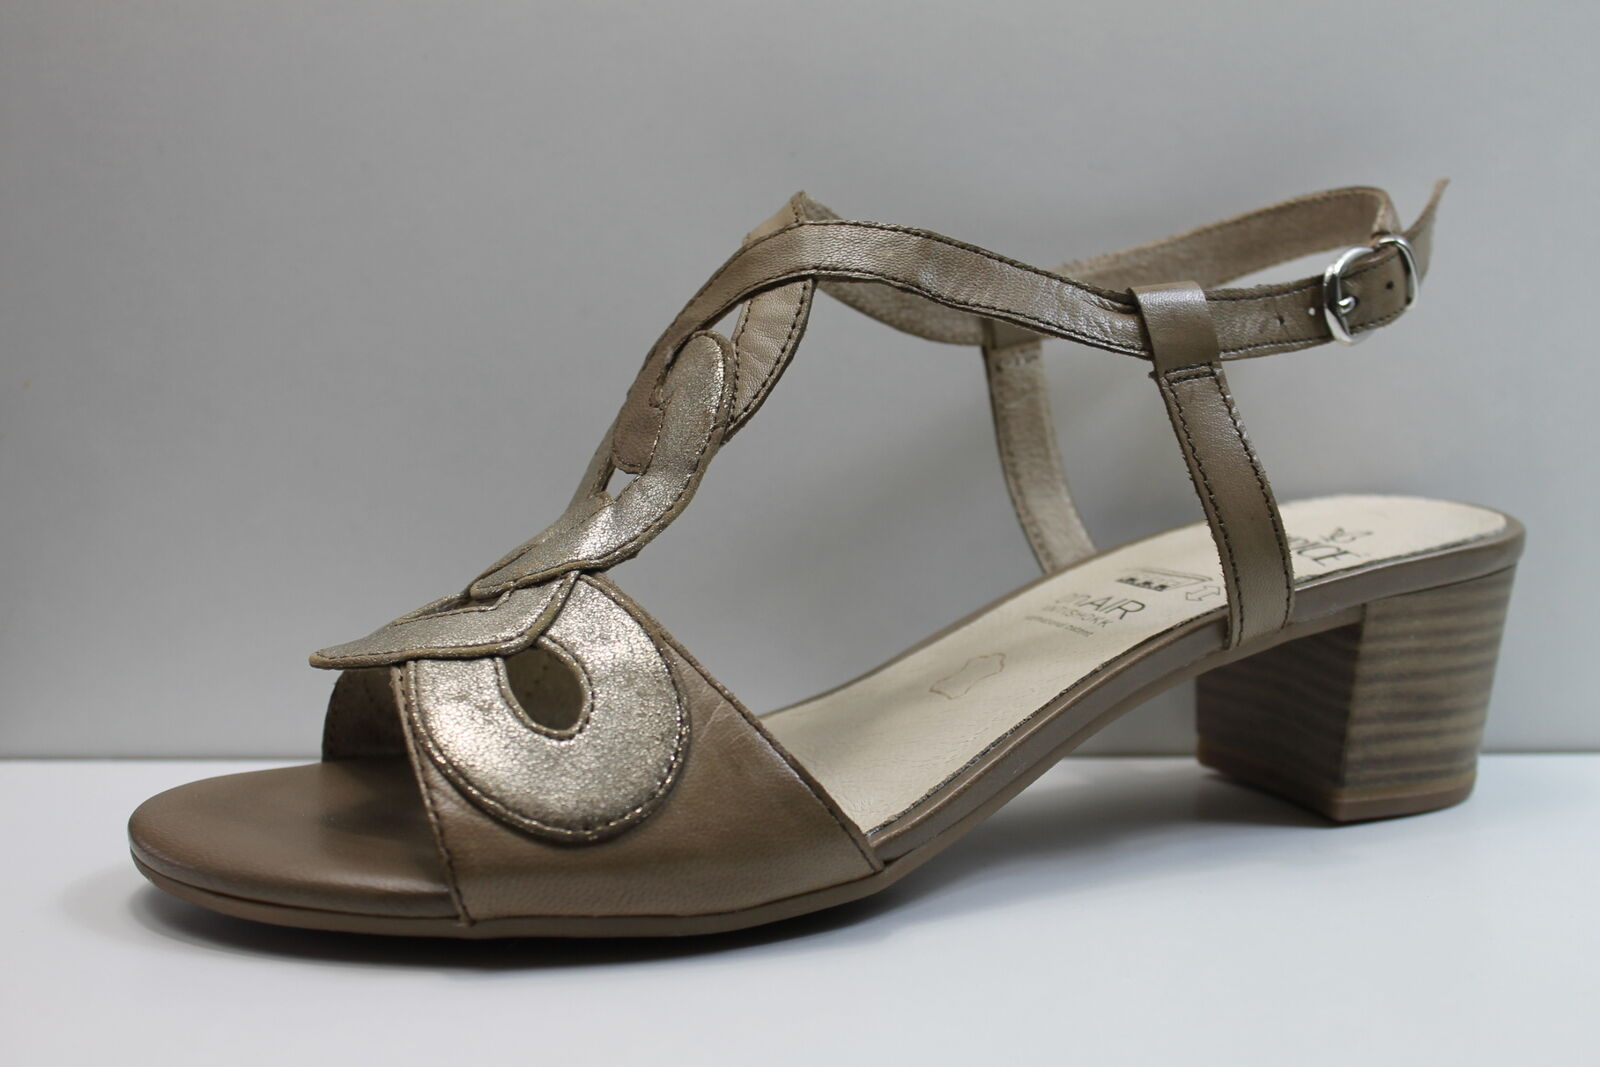 Neu Weiß Gr39 Sandaletten Weiße Caprice Damen Sandalen Pumps